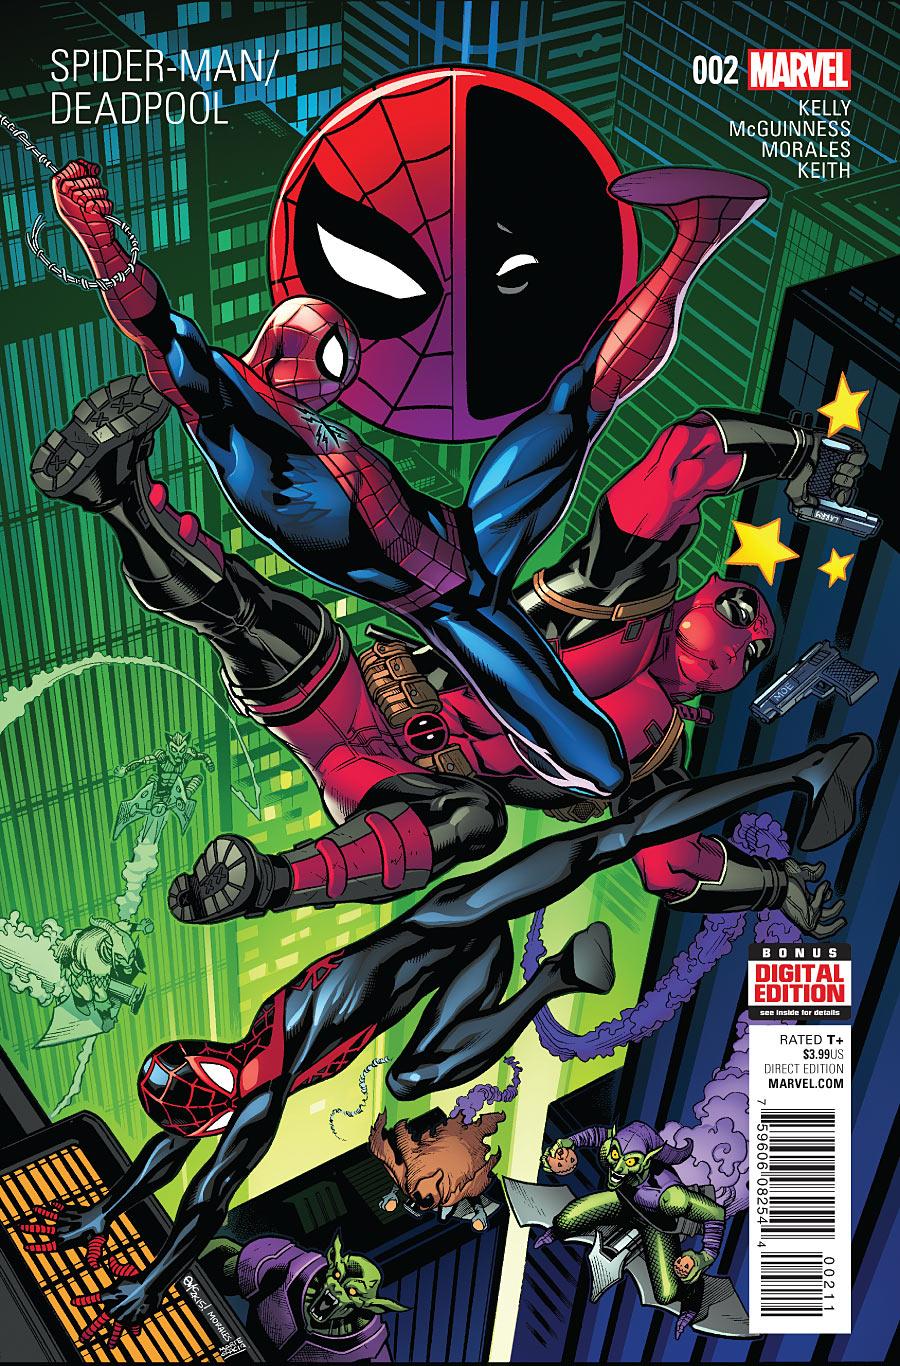 Spider-Man / Deadpool #2